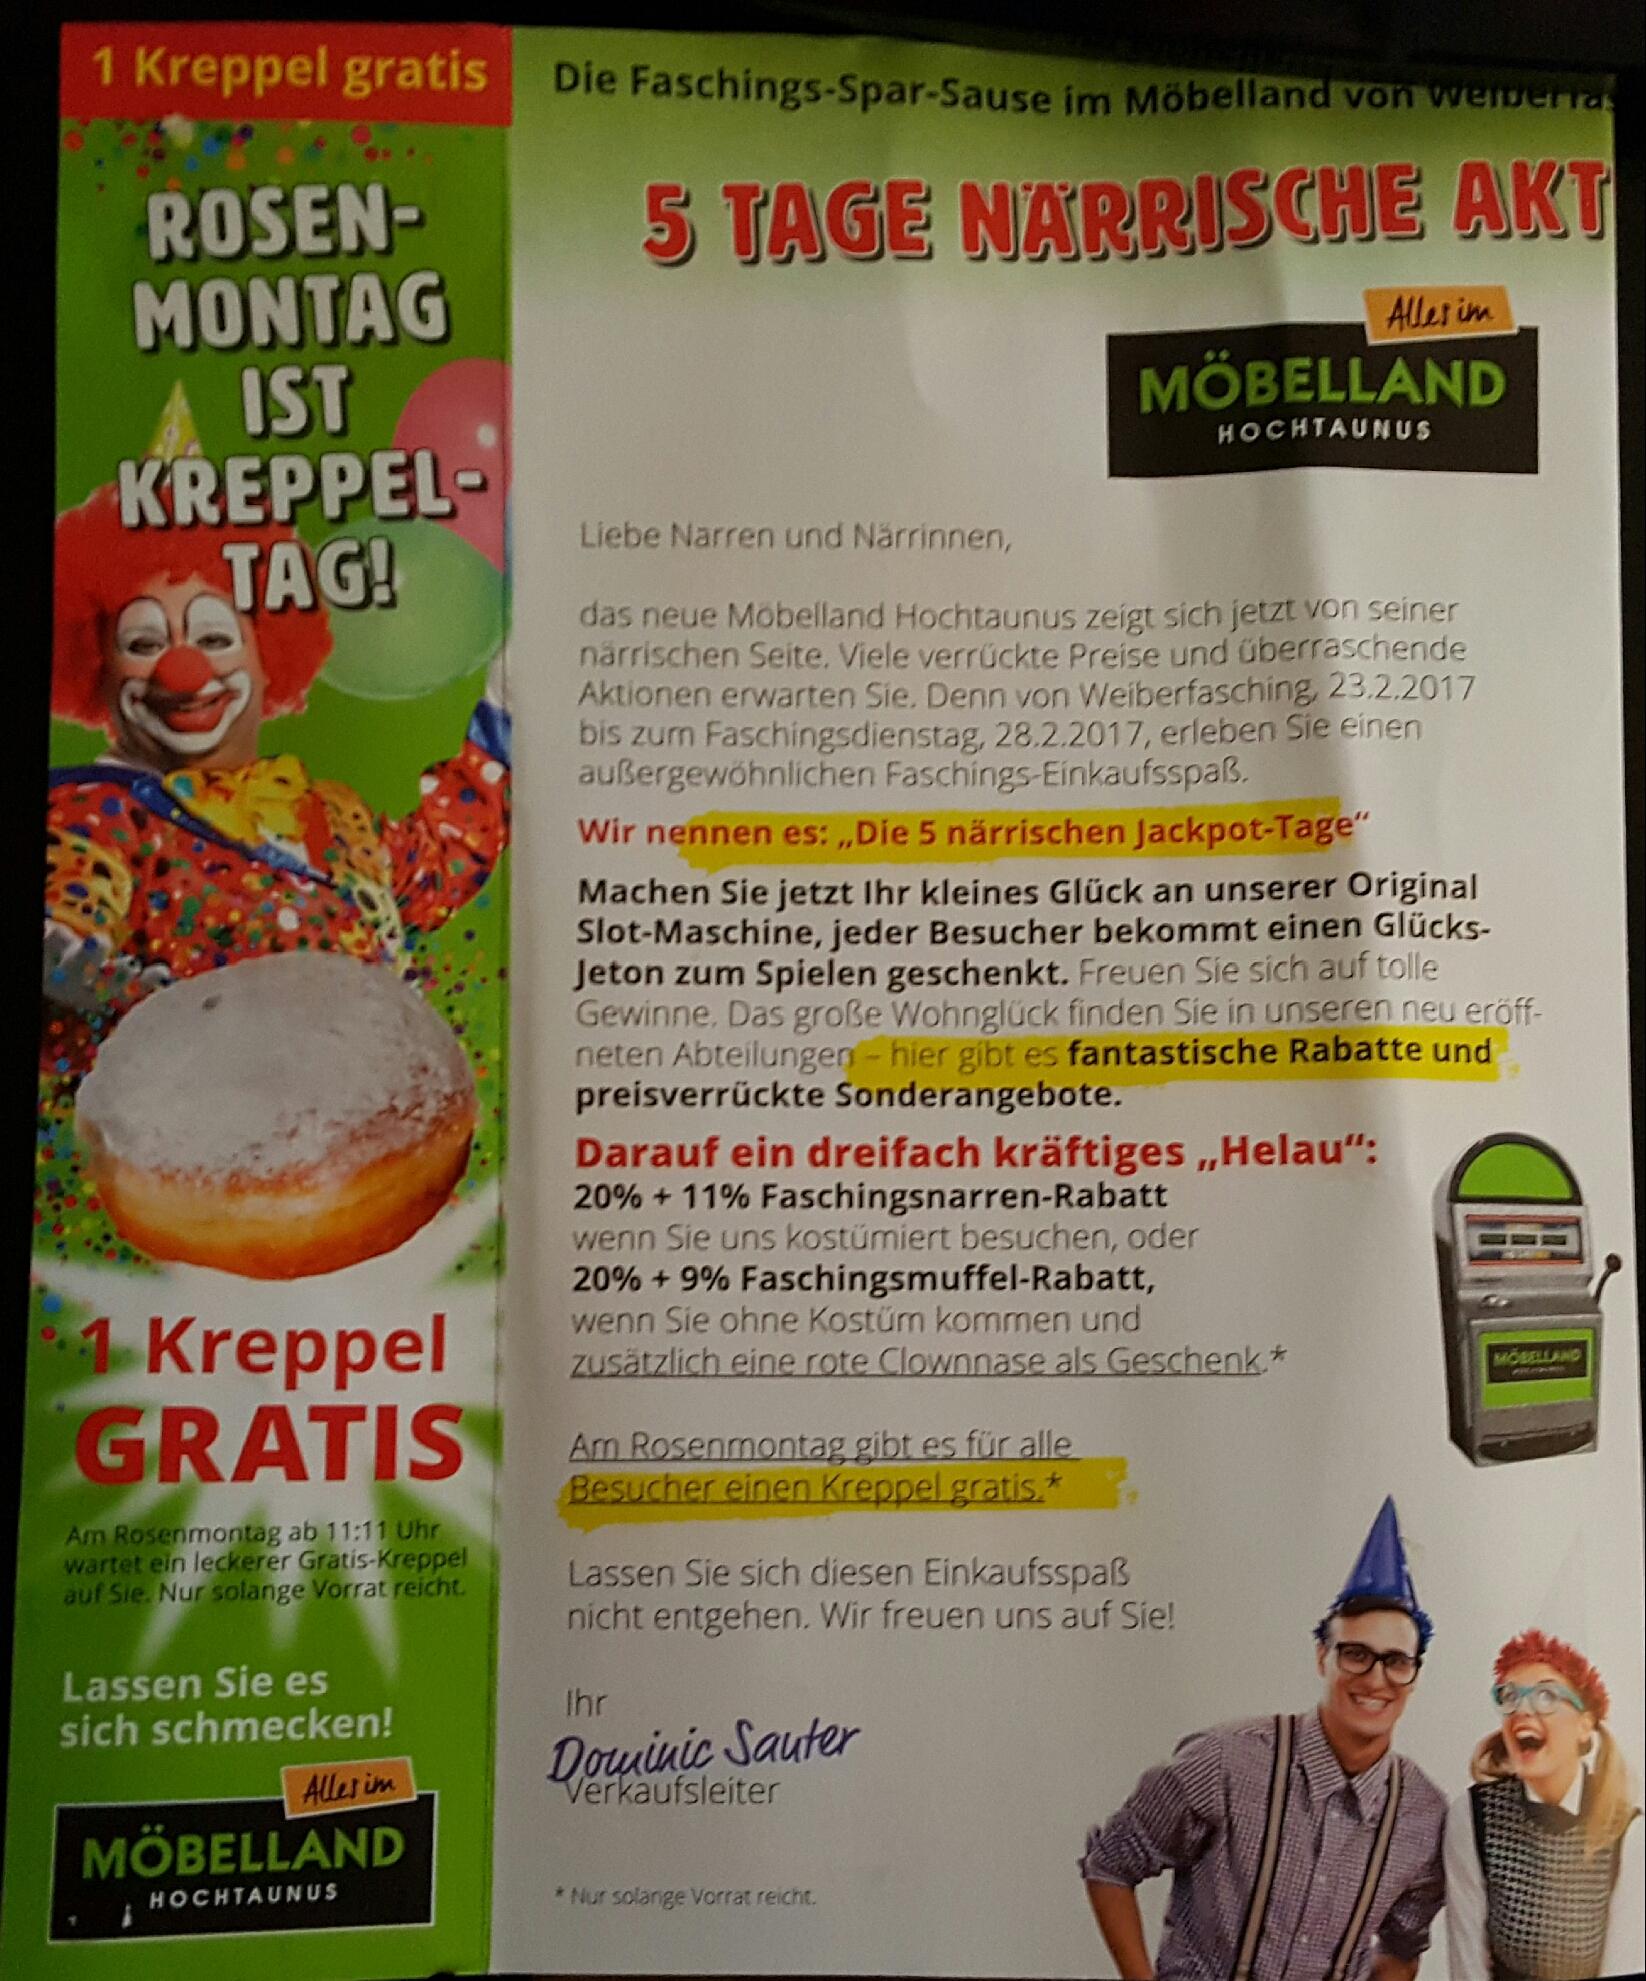 [Lokal Bad Homburg] 1 Kreppel gratis bei Möbelland Hochtaunus am Rosenmontag (27.02.17)